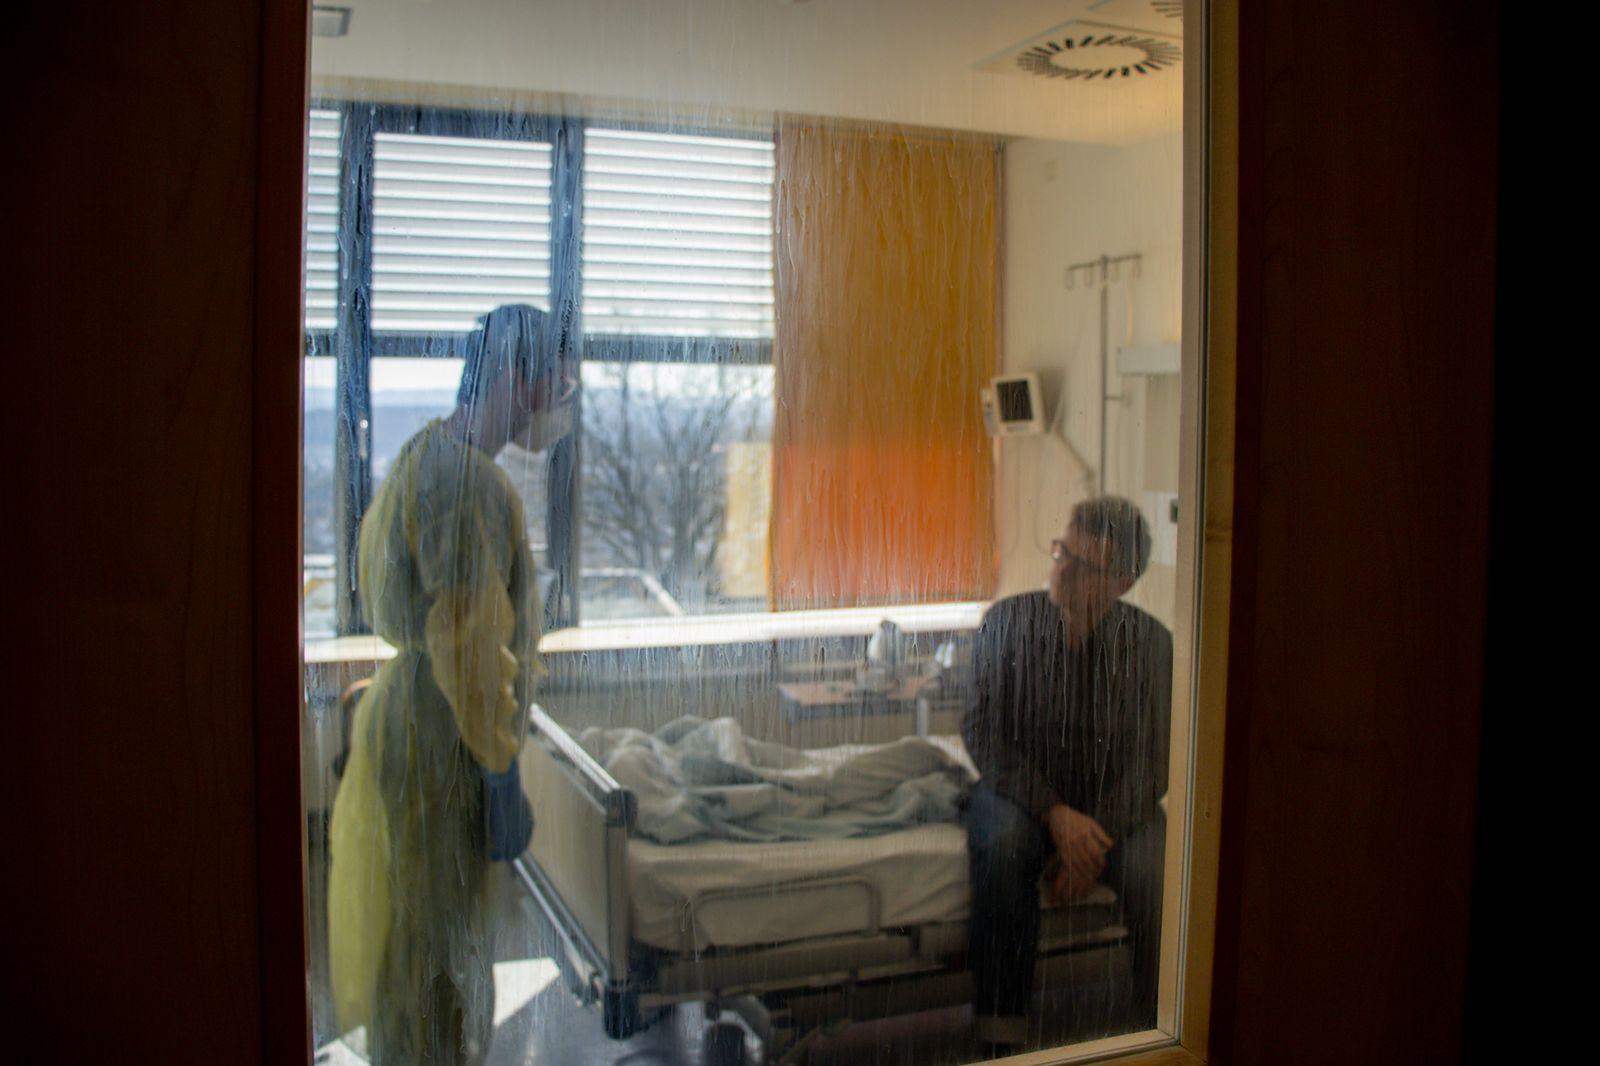 Dr. Fusco im Gespräch mit Corona-Patient